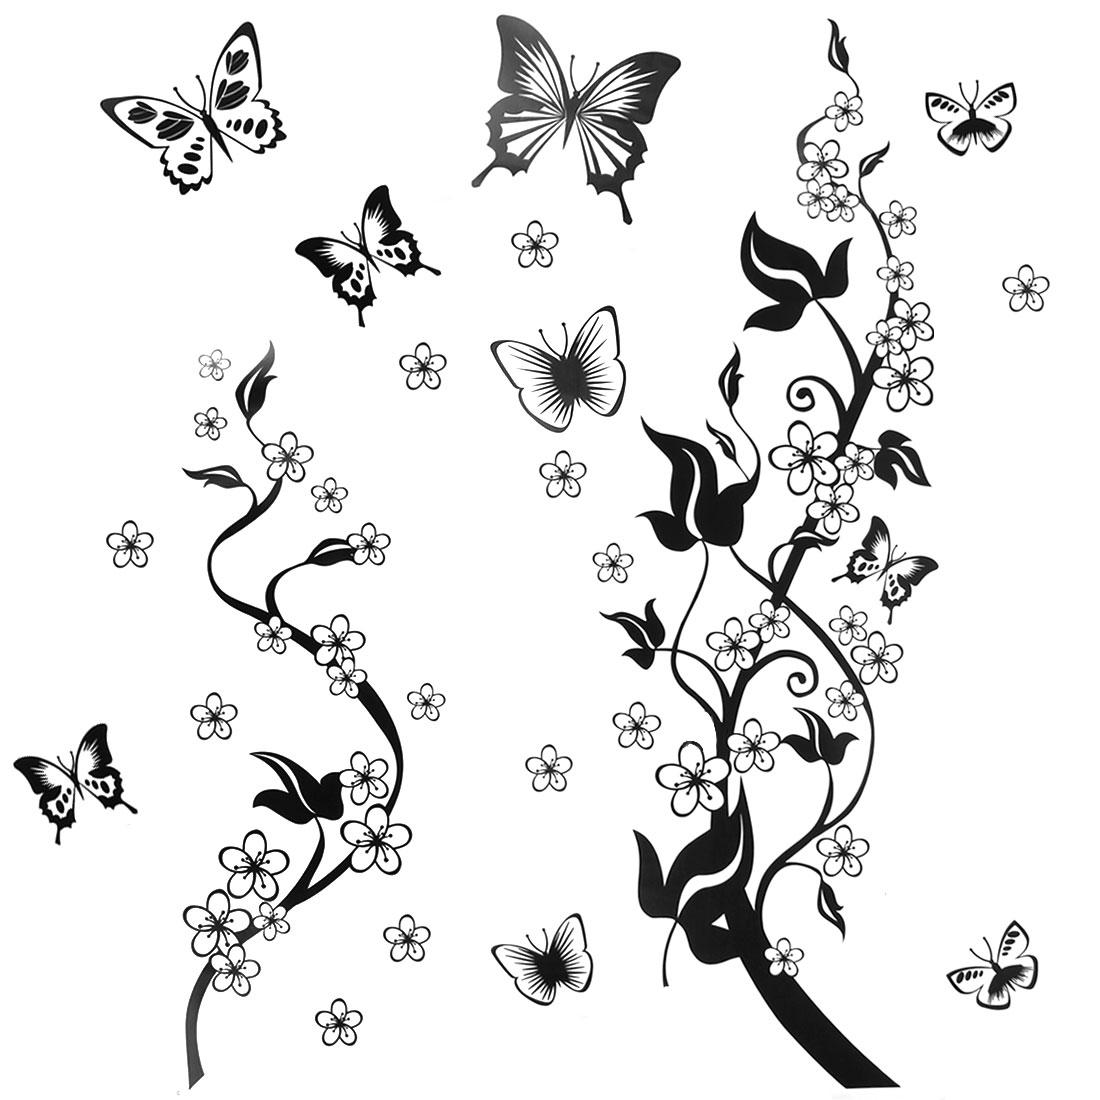 Bedroom Accent DIY Mural Flower Rattan Butterfly Wall Sticker 60cmx90cm Black